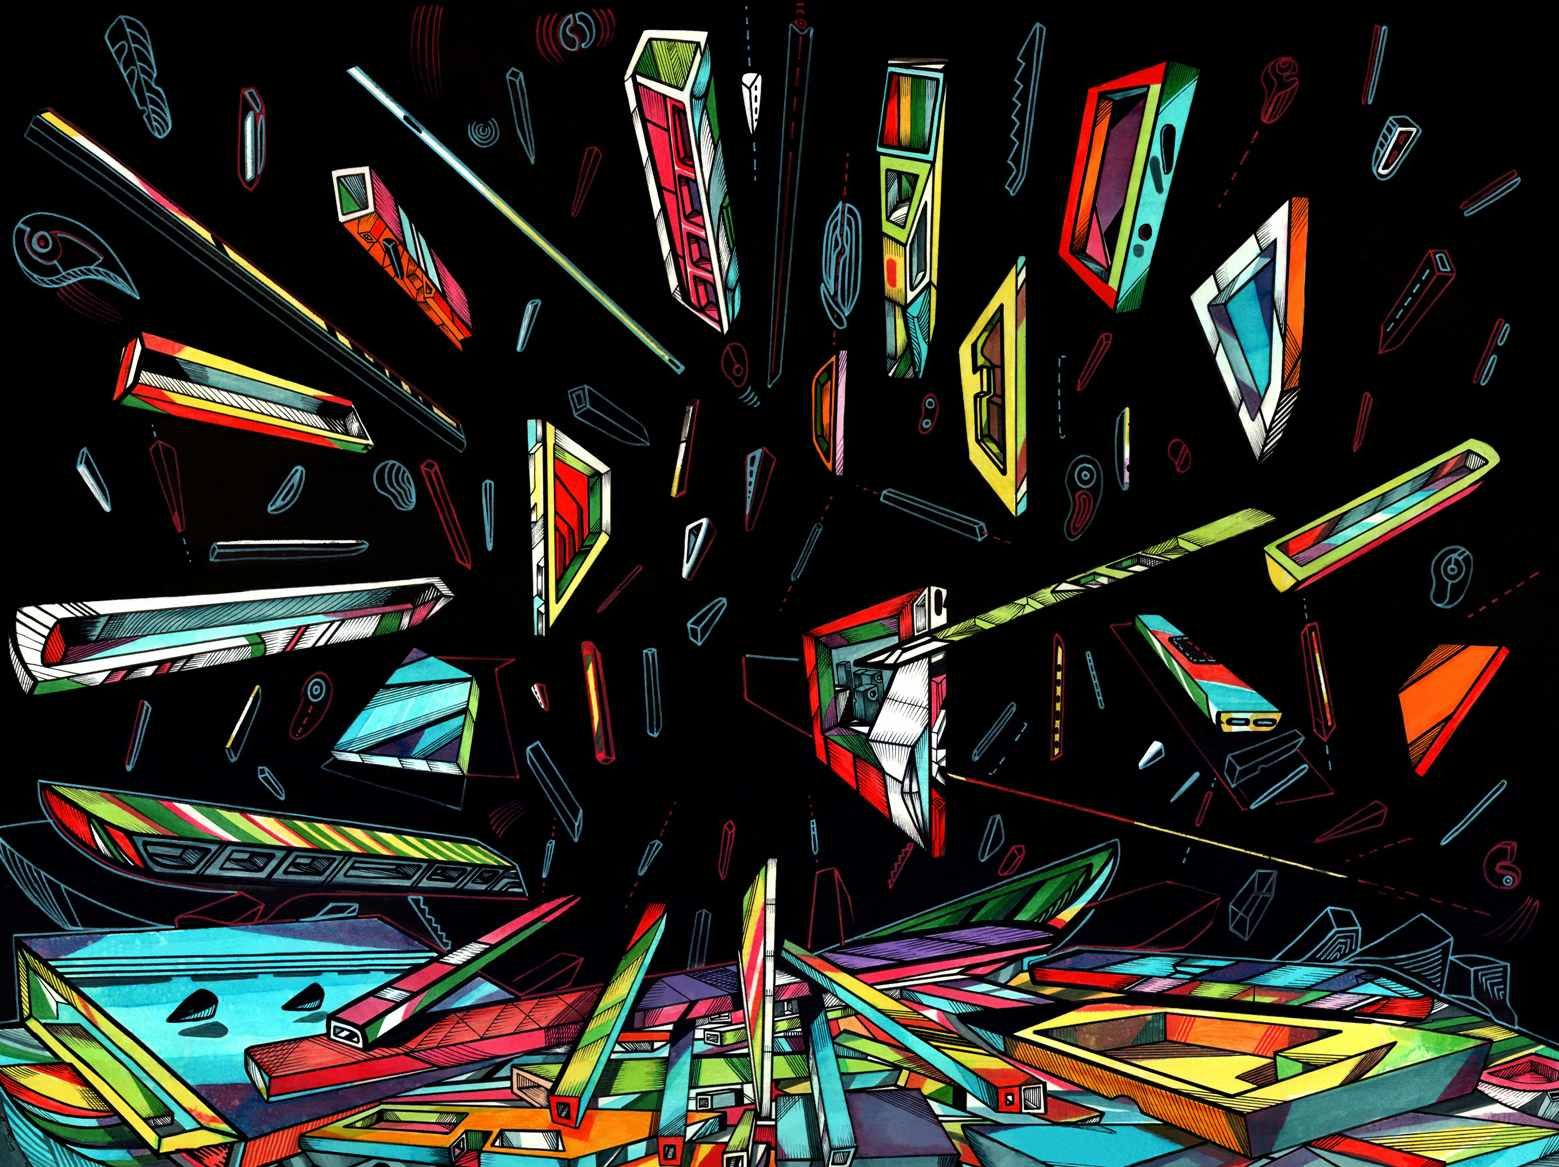 Expanse 1, 100 x 70 cm, acrylic on paper, 2018, artist Marko Gavrilovic